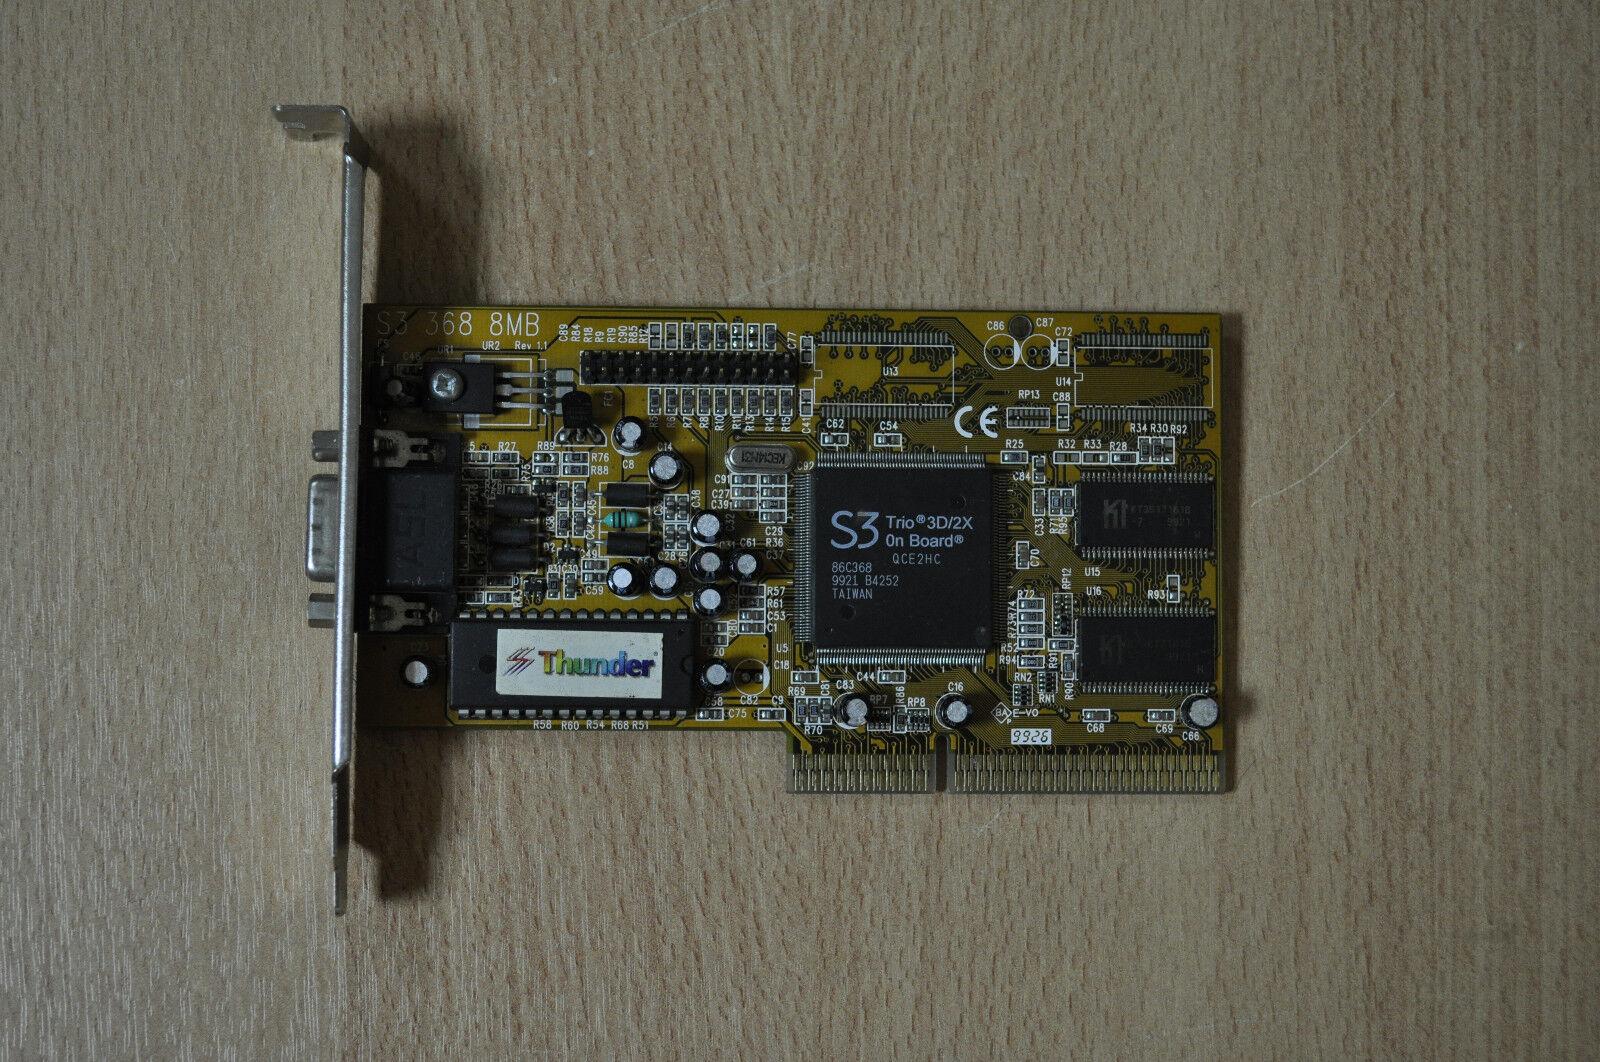 S3 Trio3D/2XQCE2HC 86C3689921 B4252 TAIWAN 4MB Thunder AGP Video Graphics Card